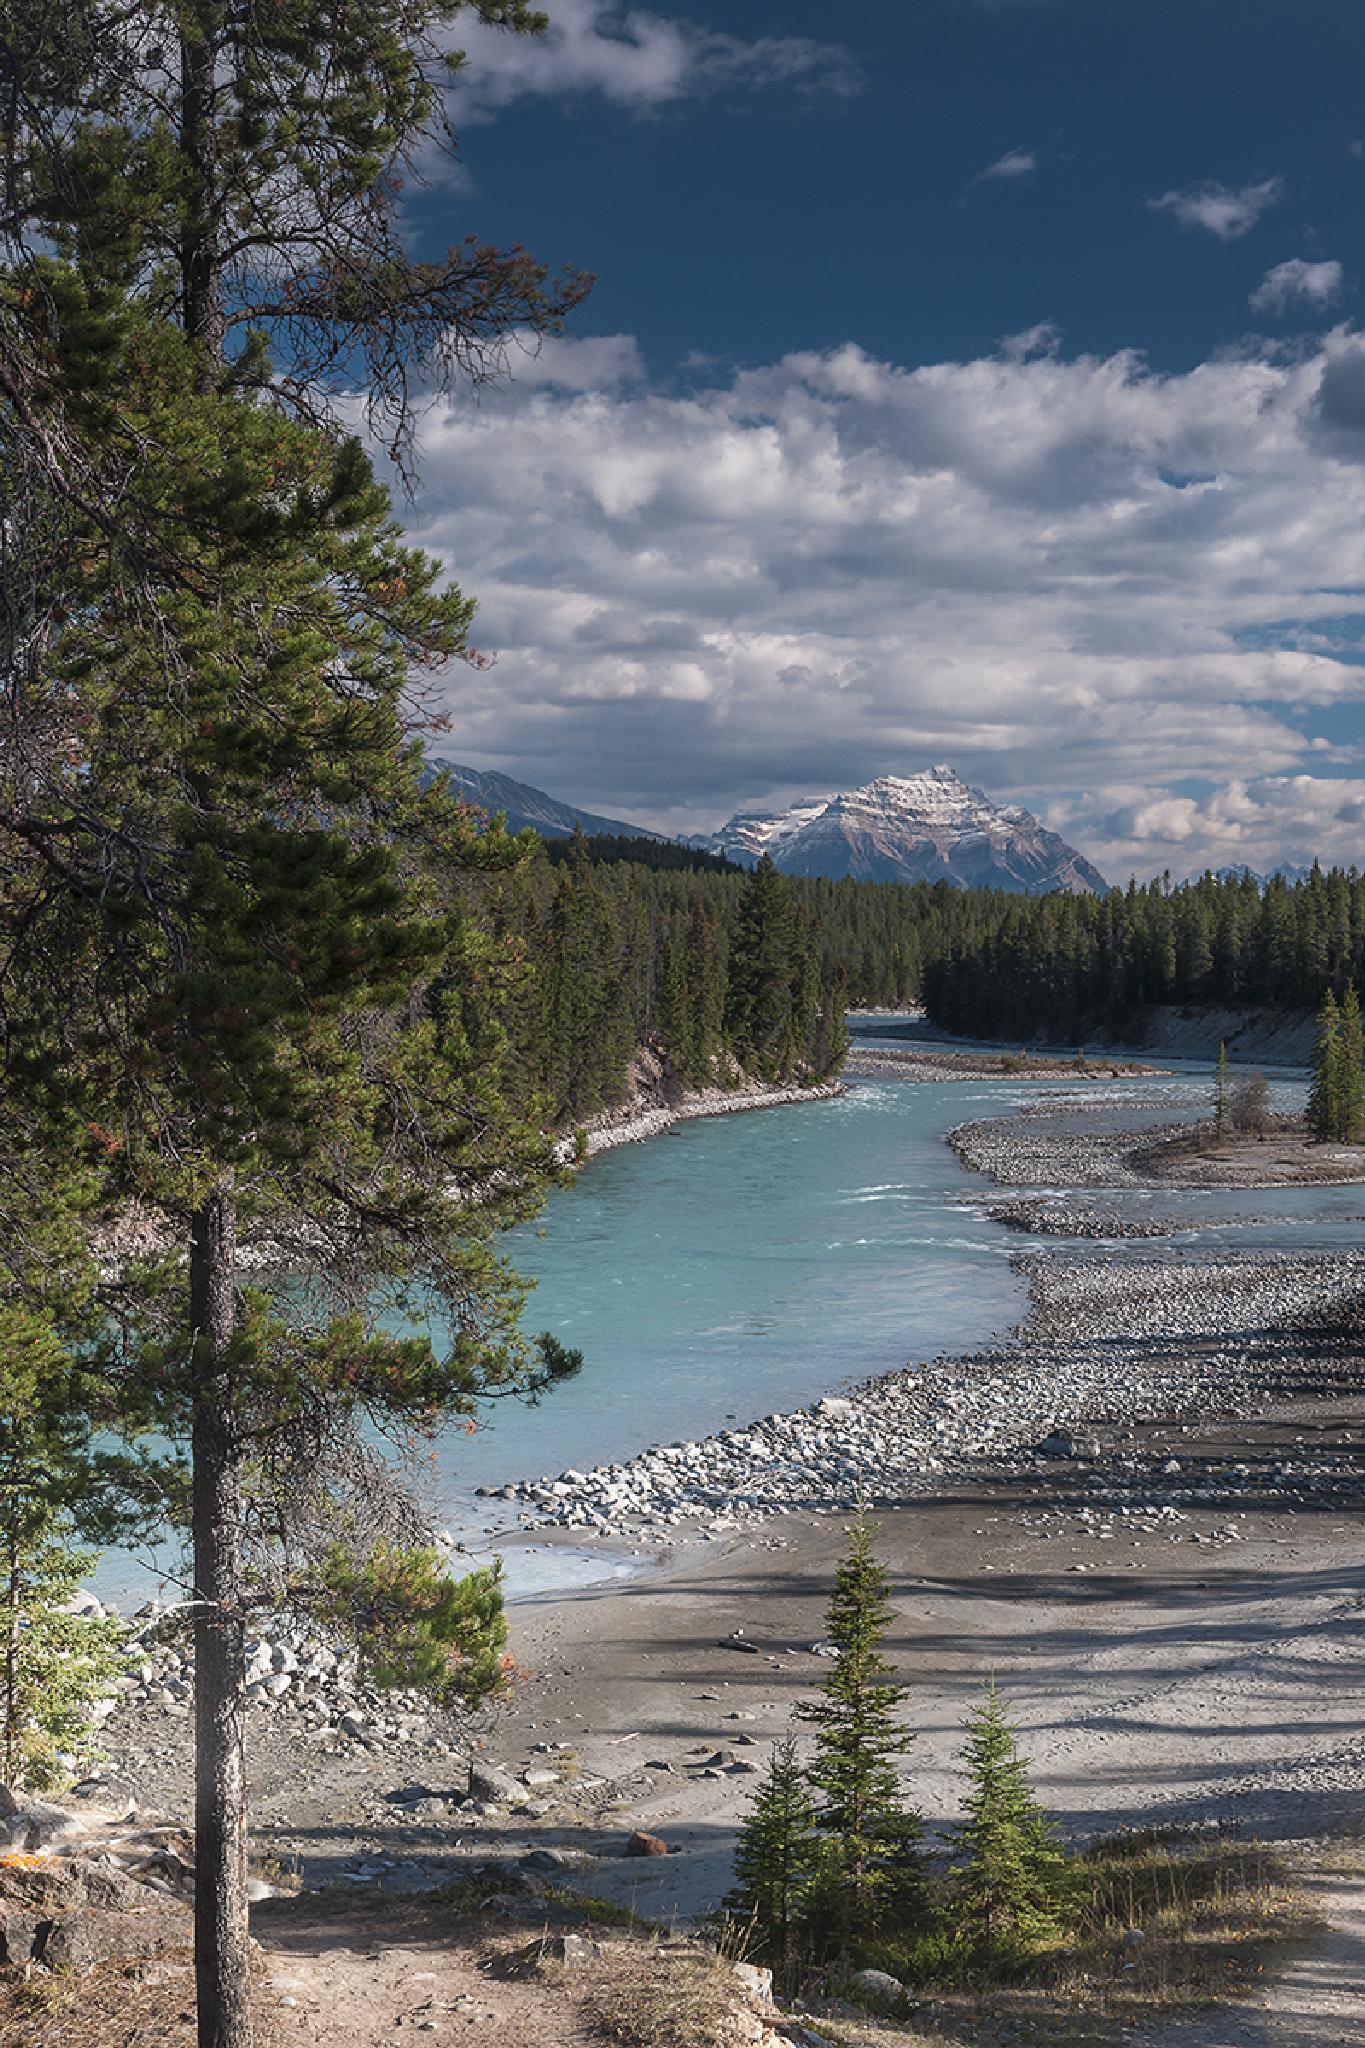 Athabasca River, Jasper by CJones64